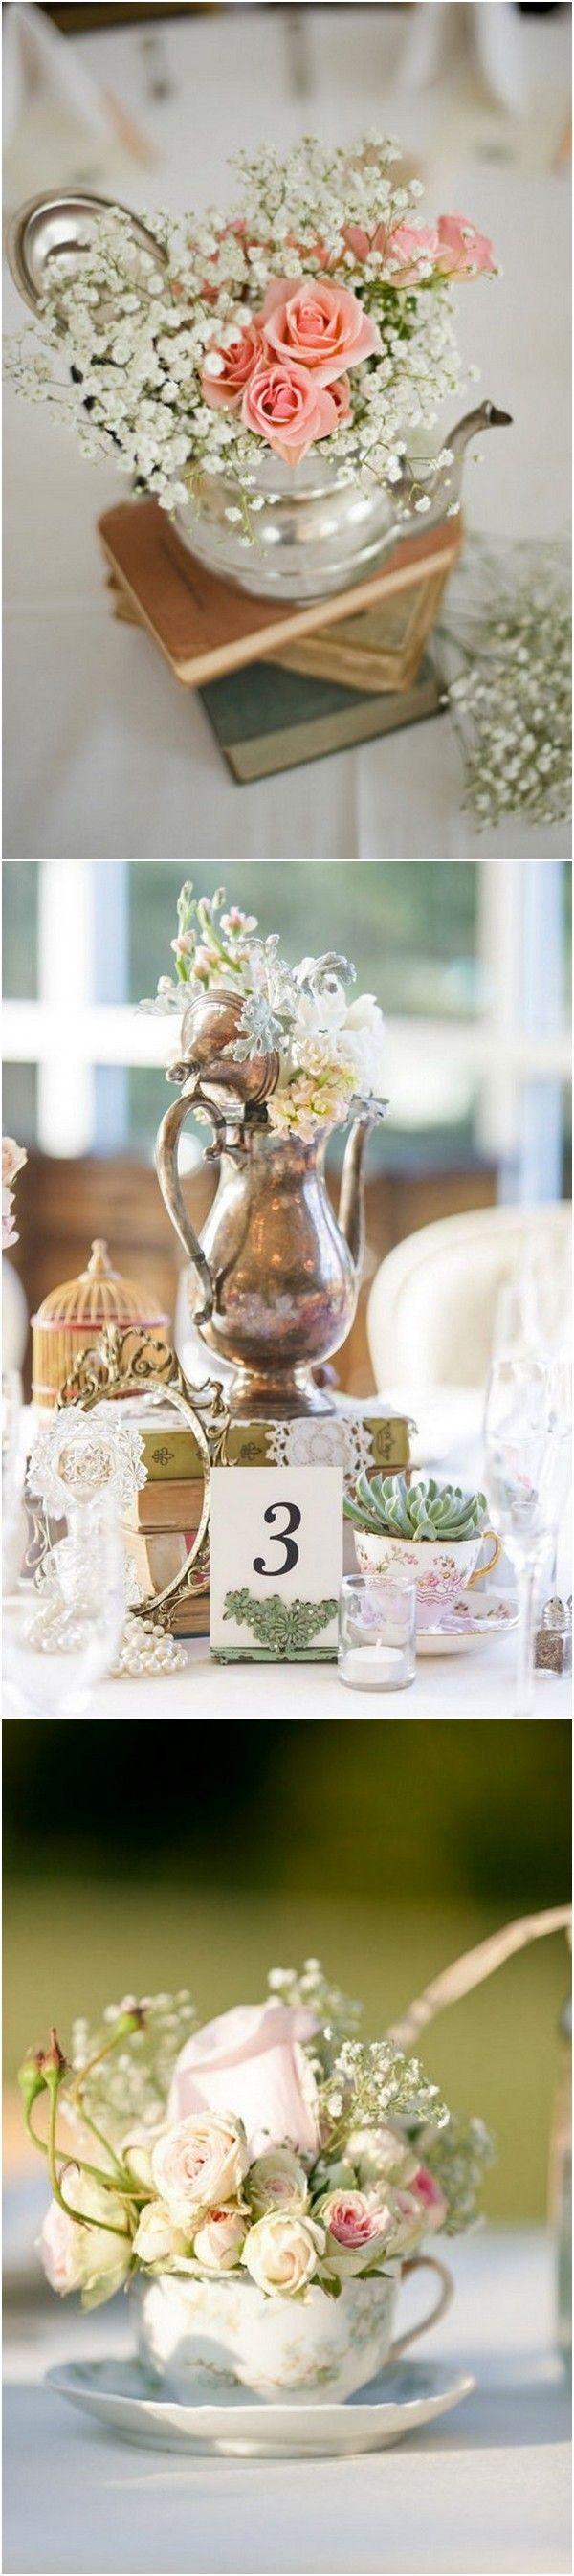 50 fabulous vintage wedding centerpiece decoration ideas vintage teacups vintage wedding centerpiece ideas junglespirit Gallery